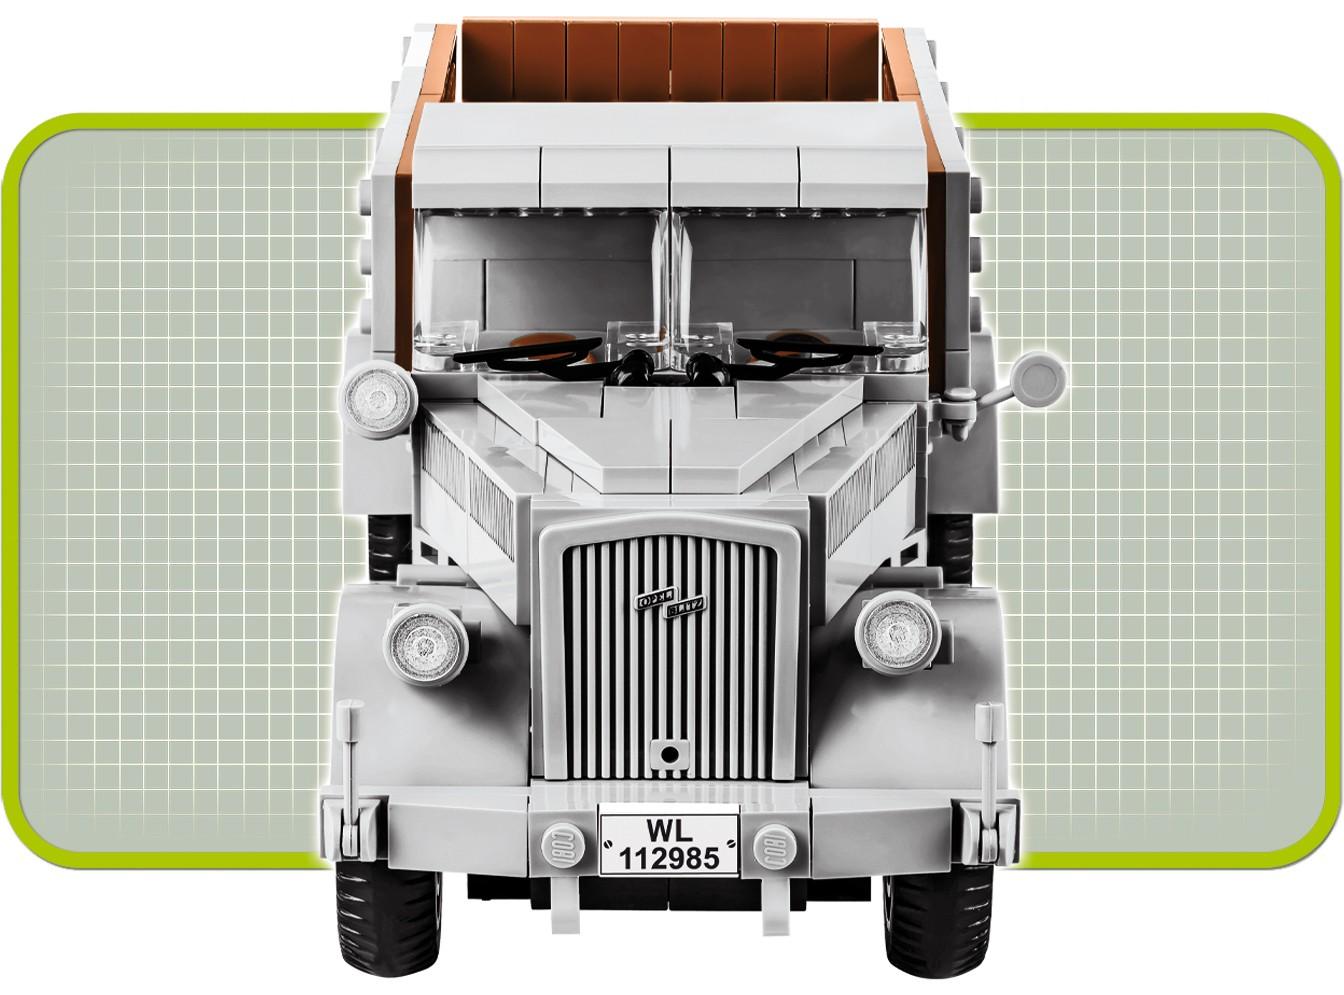 Cobi 2449A Opel Blitz 3t Armee Lastwagen 2 Weltkrieg WW2 Baustein-Modell 310T